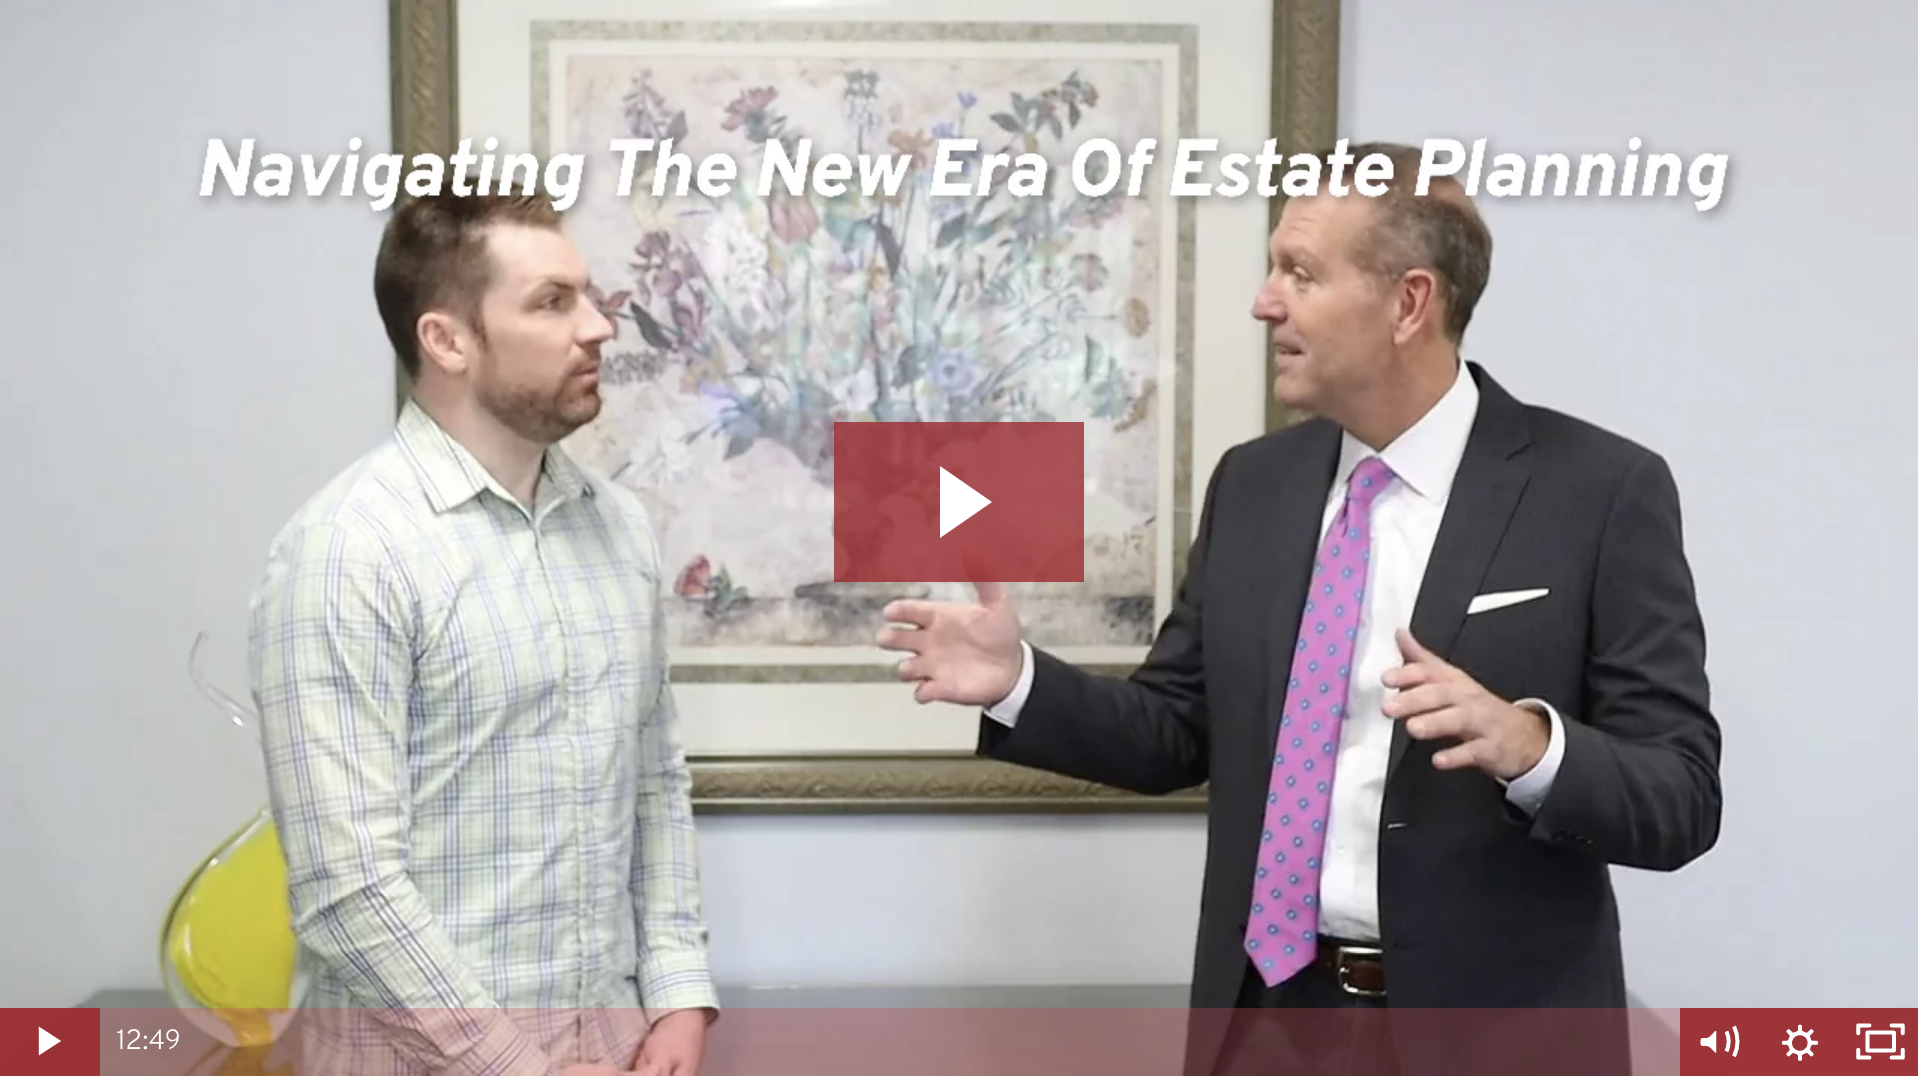 Navigating The New Era of Estate Planning